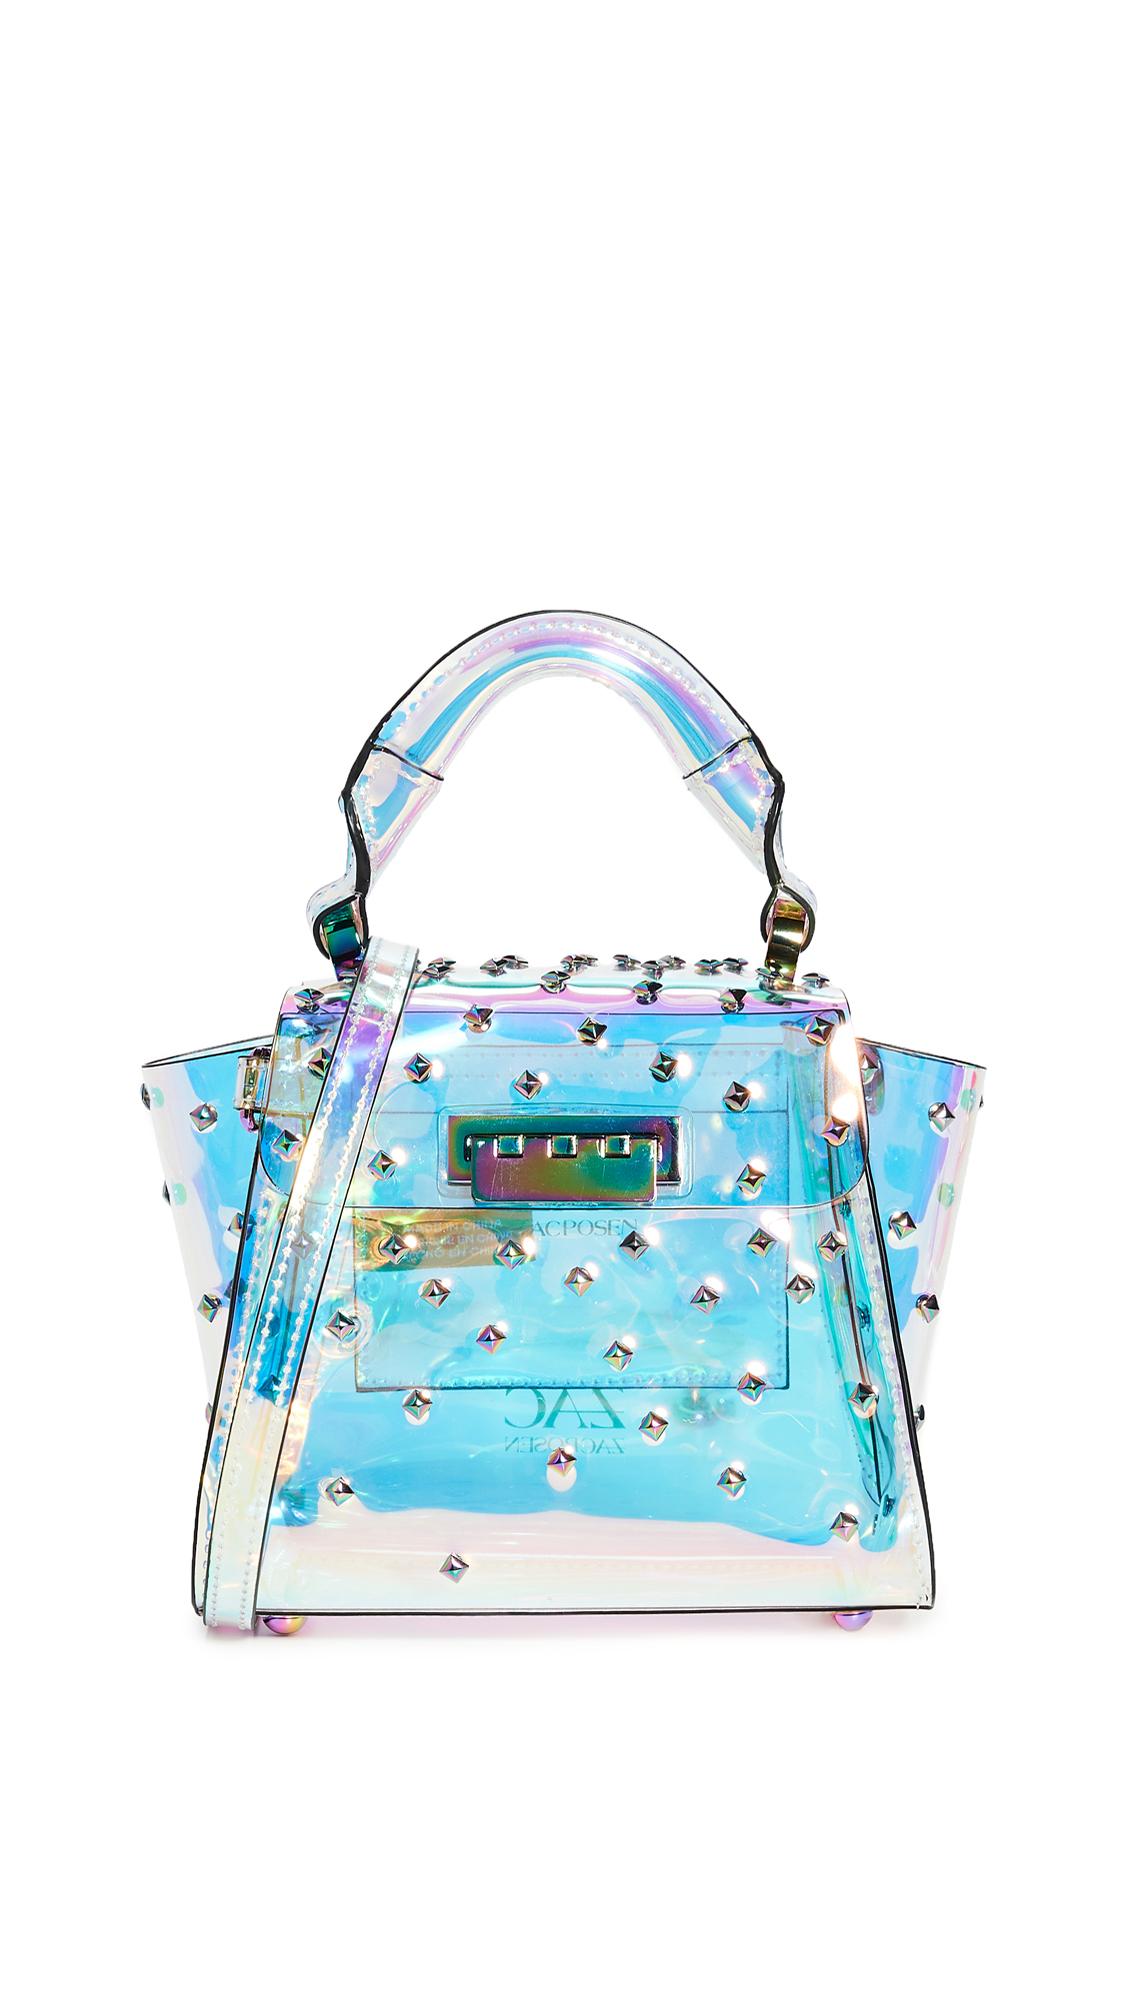 Zac Zac Posen Eartha Mini Top Handle Bag In Iridescent Constellation